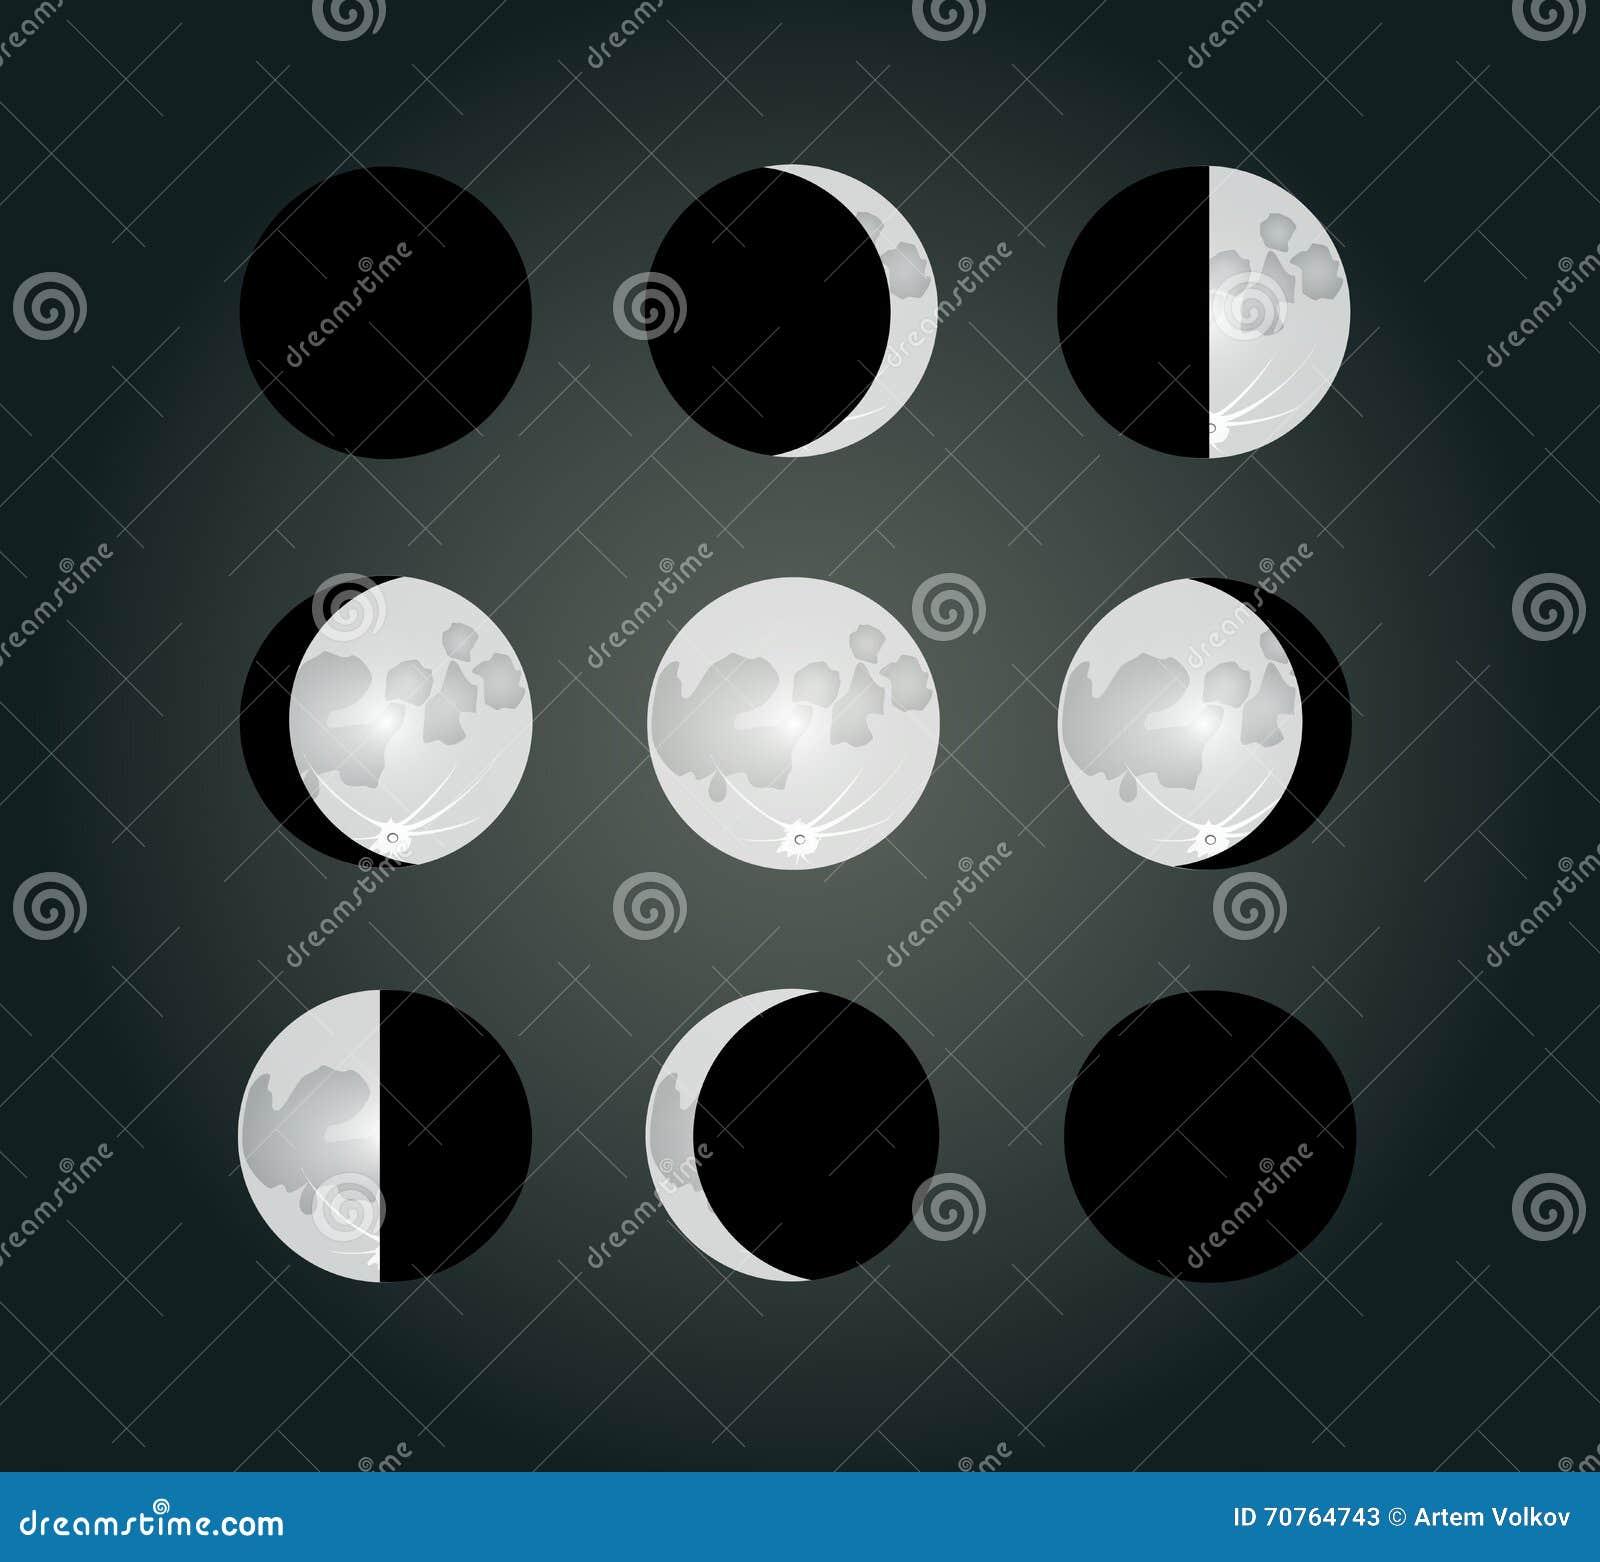 Moon Calendar Illustration : Moon phases on a dark background eps vector